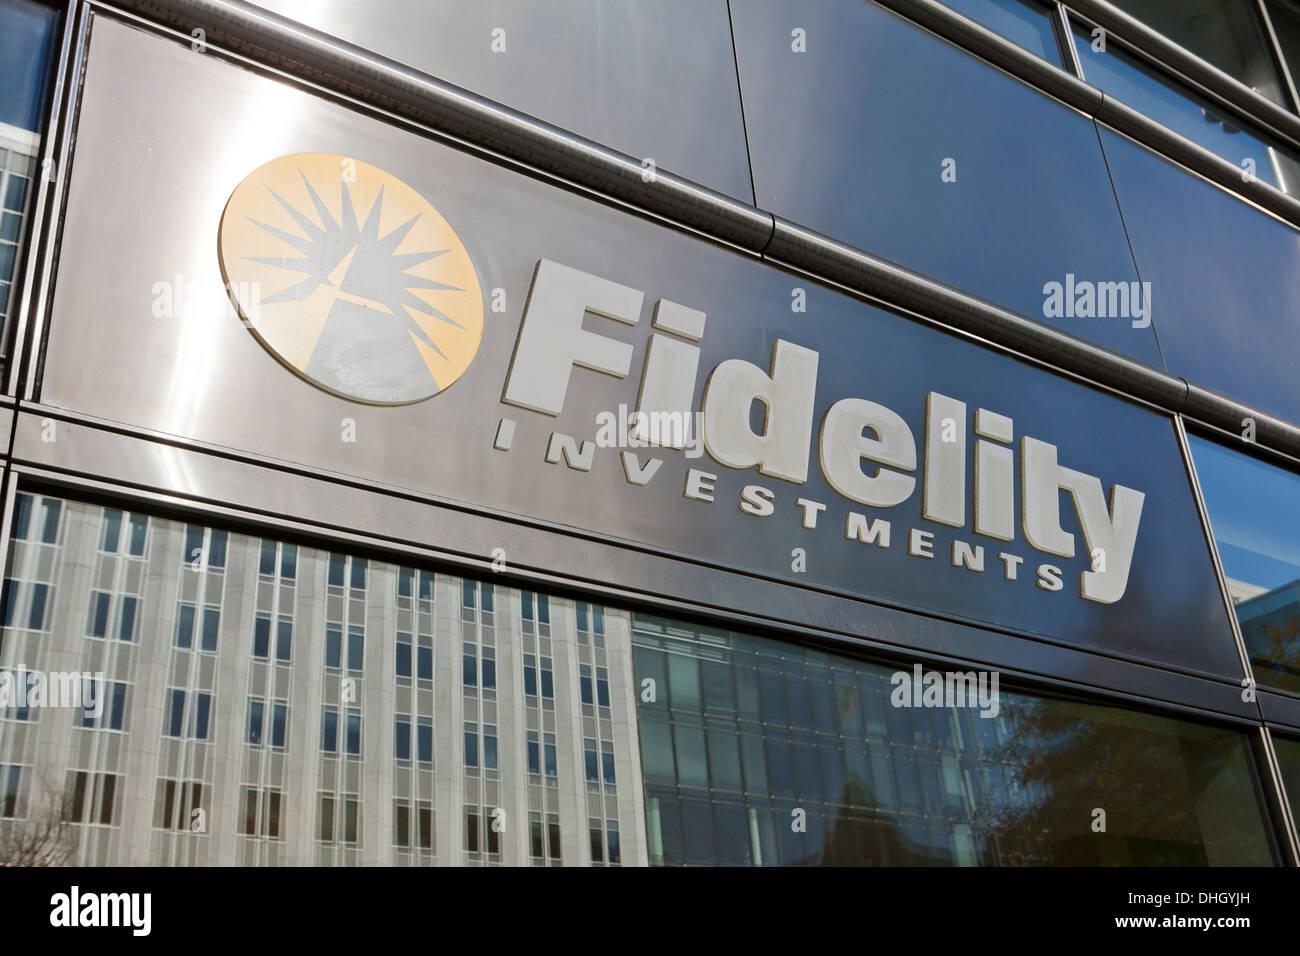 Fidelity Investments office sign - Washington, DC USA - Stock Image